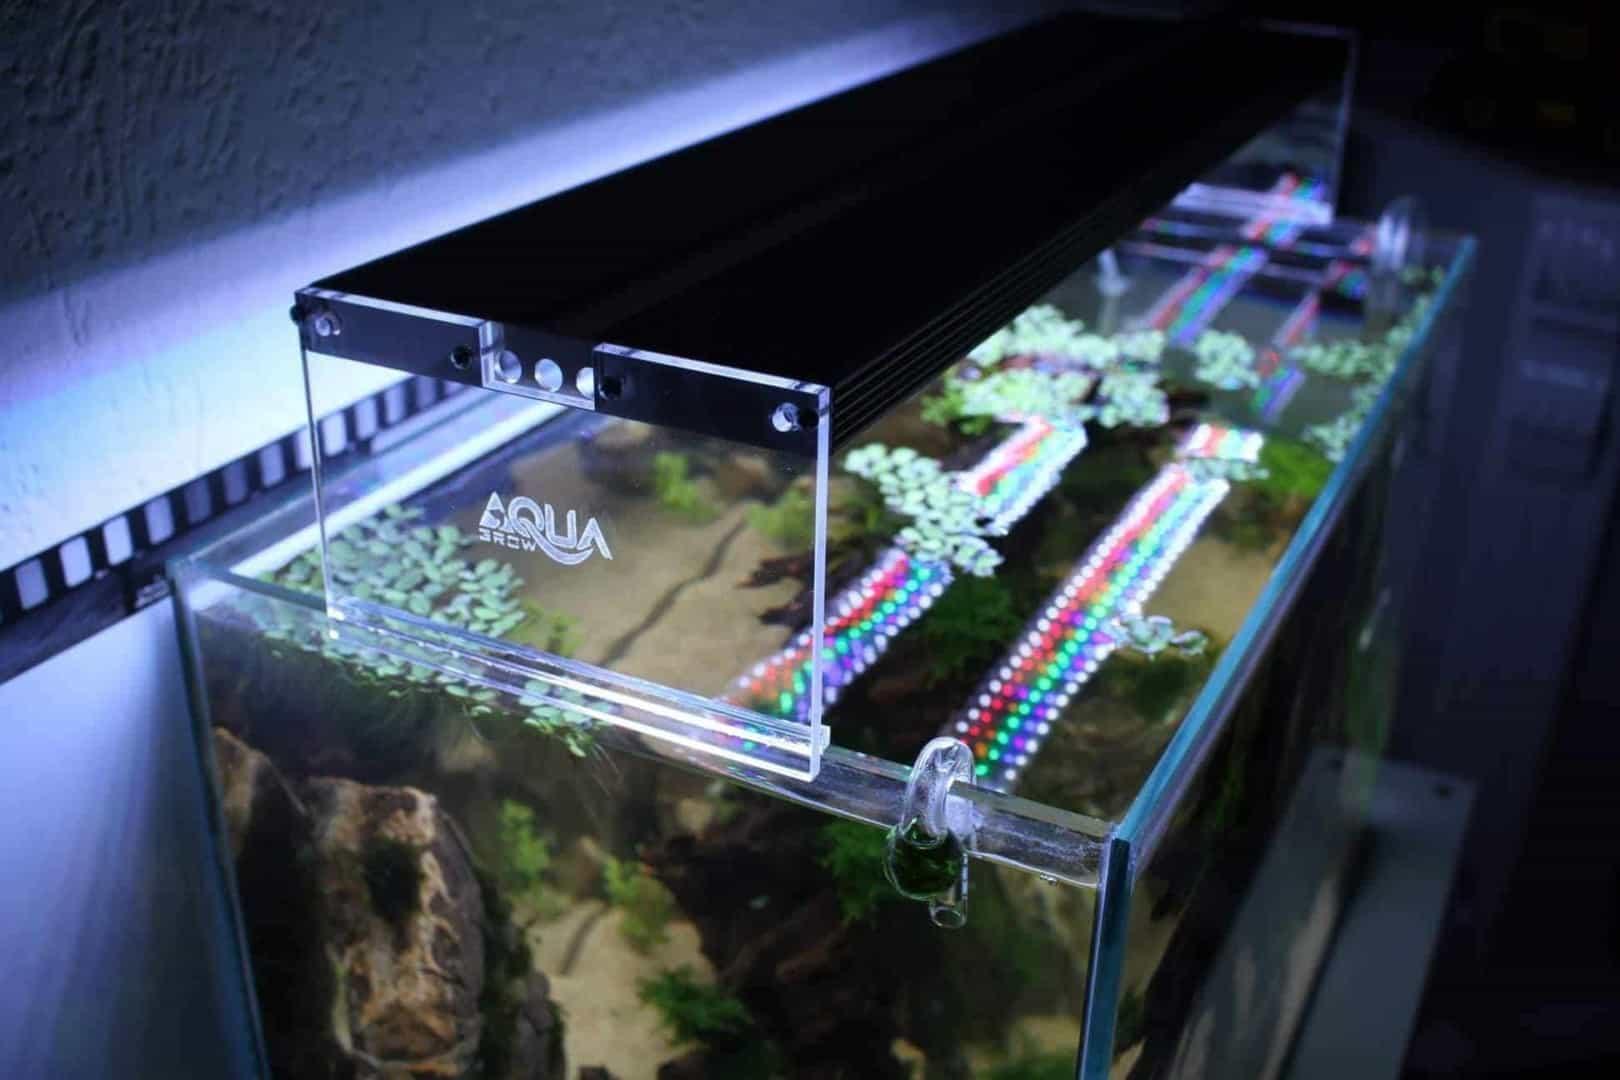 186 LED Aquarienbeleuchtung: Alle Details und Fakten zur Technik Teil 1 (Moritz Stapelfeld) 13